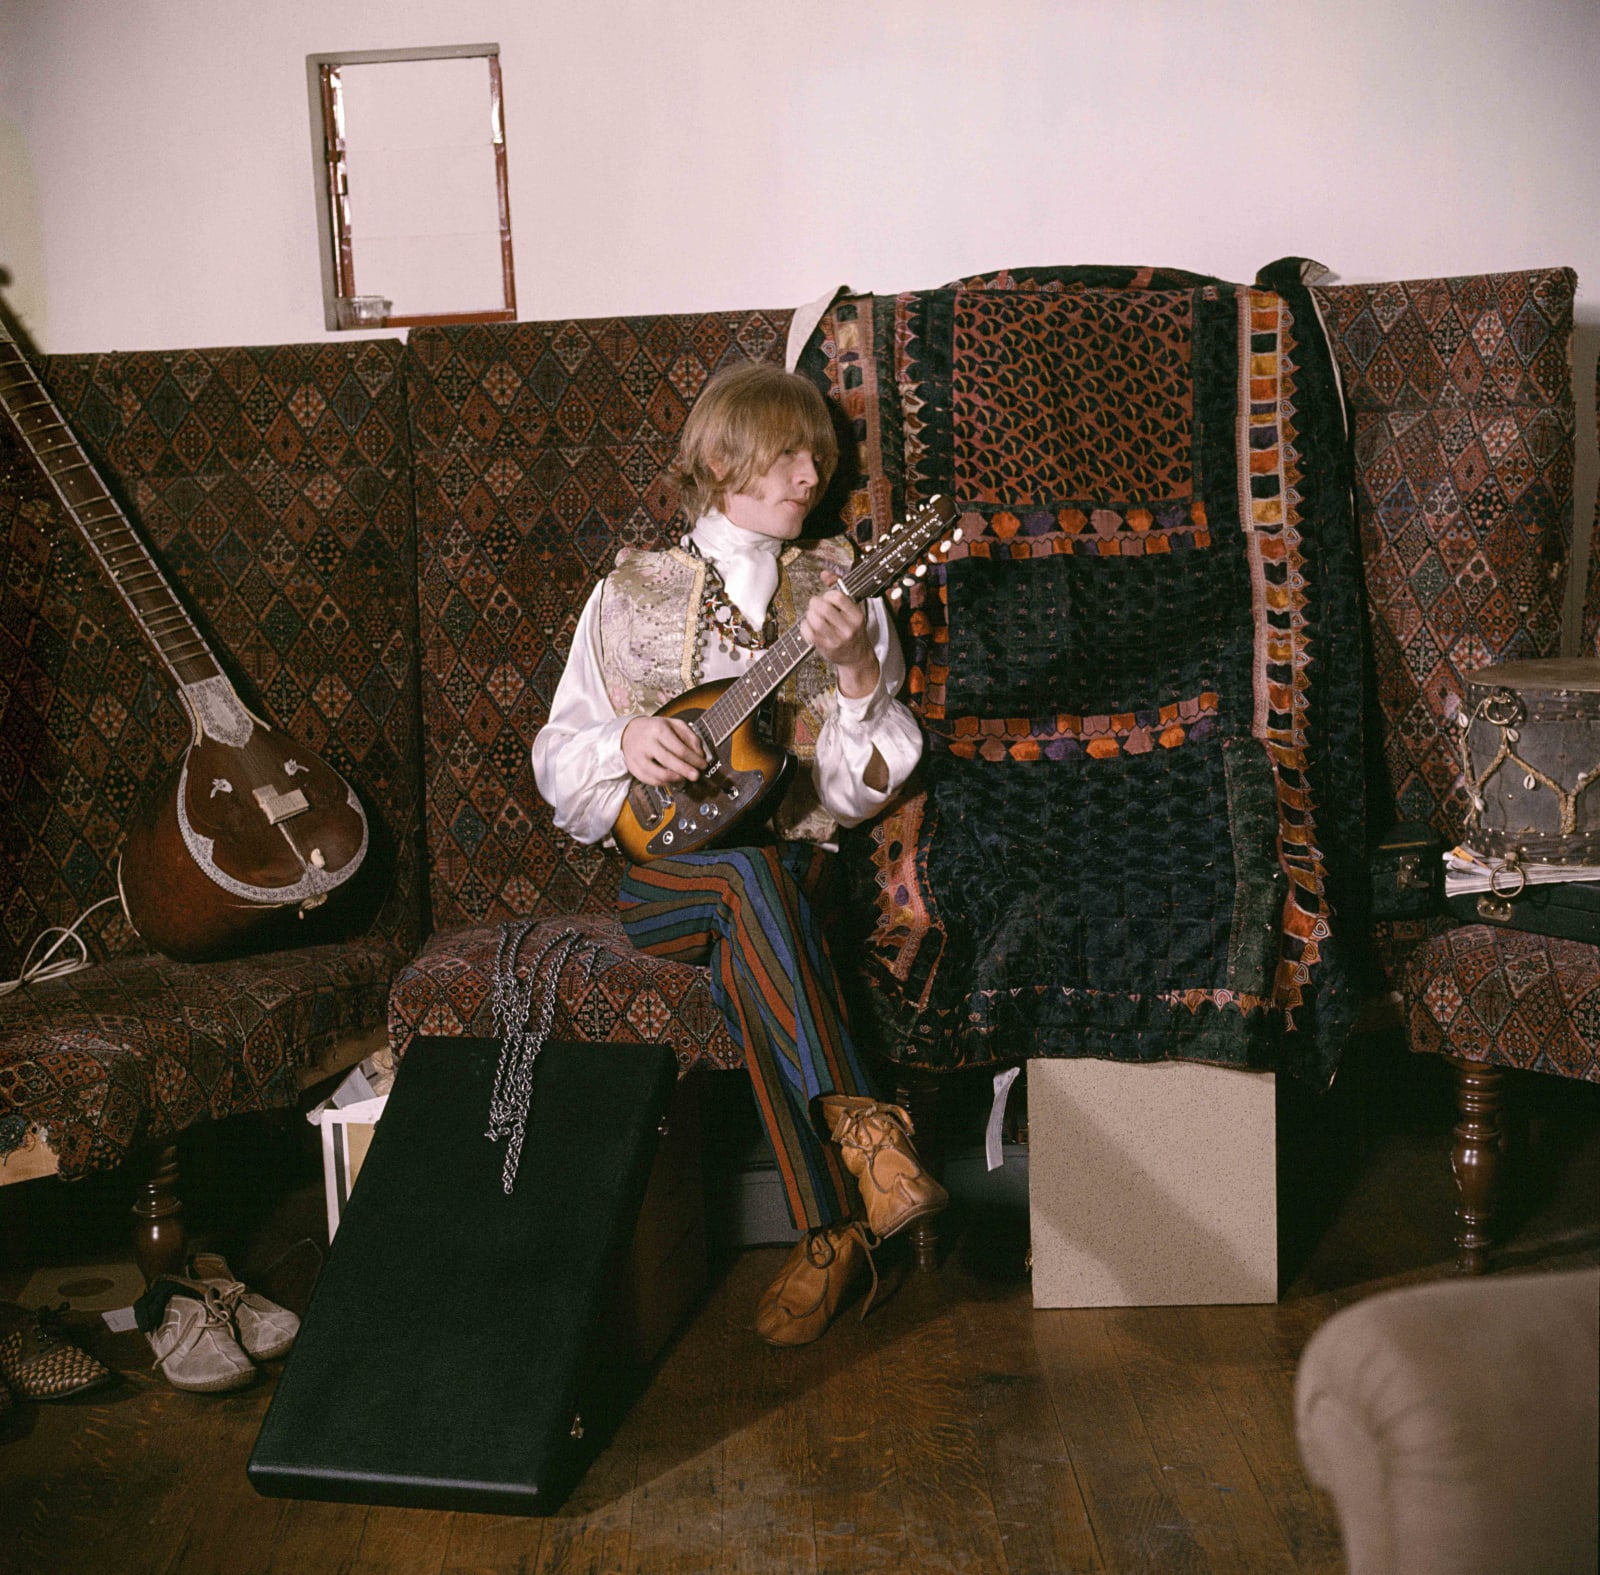 Rolling Stones, Gered Mankowitz